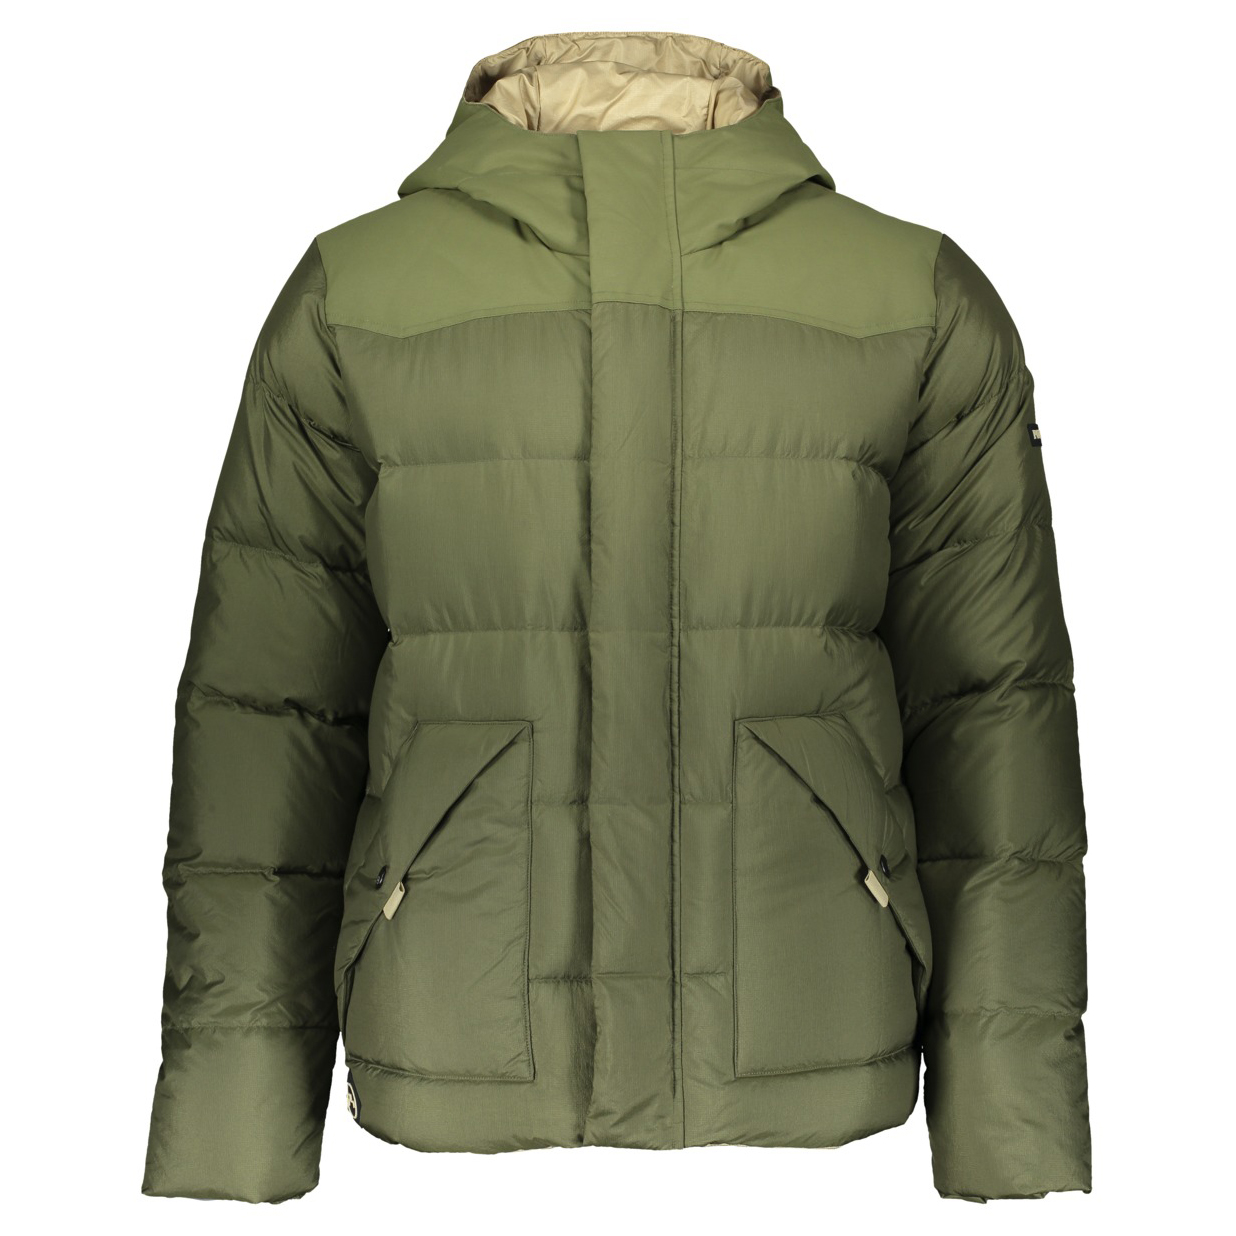 Powderhorn Jackson Shot 7 Jacket Down jacket Men's | Buy